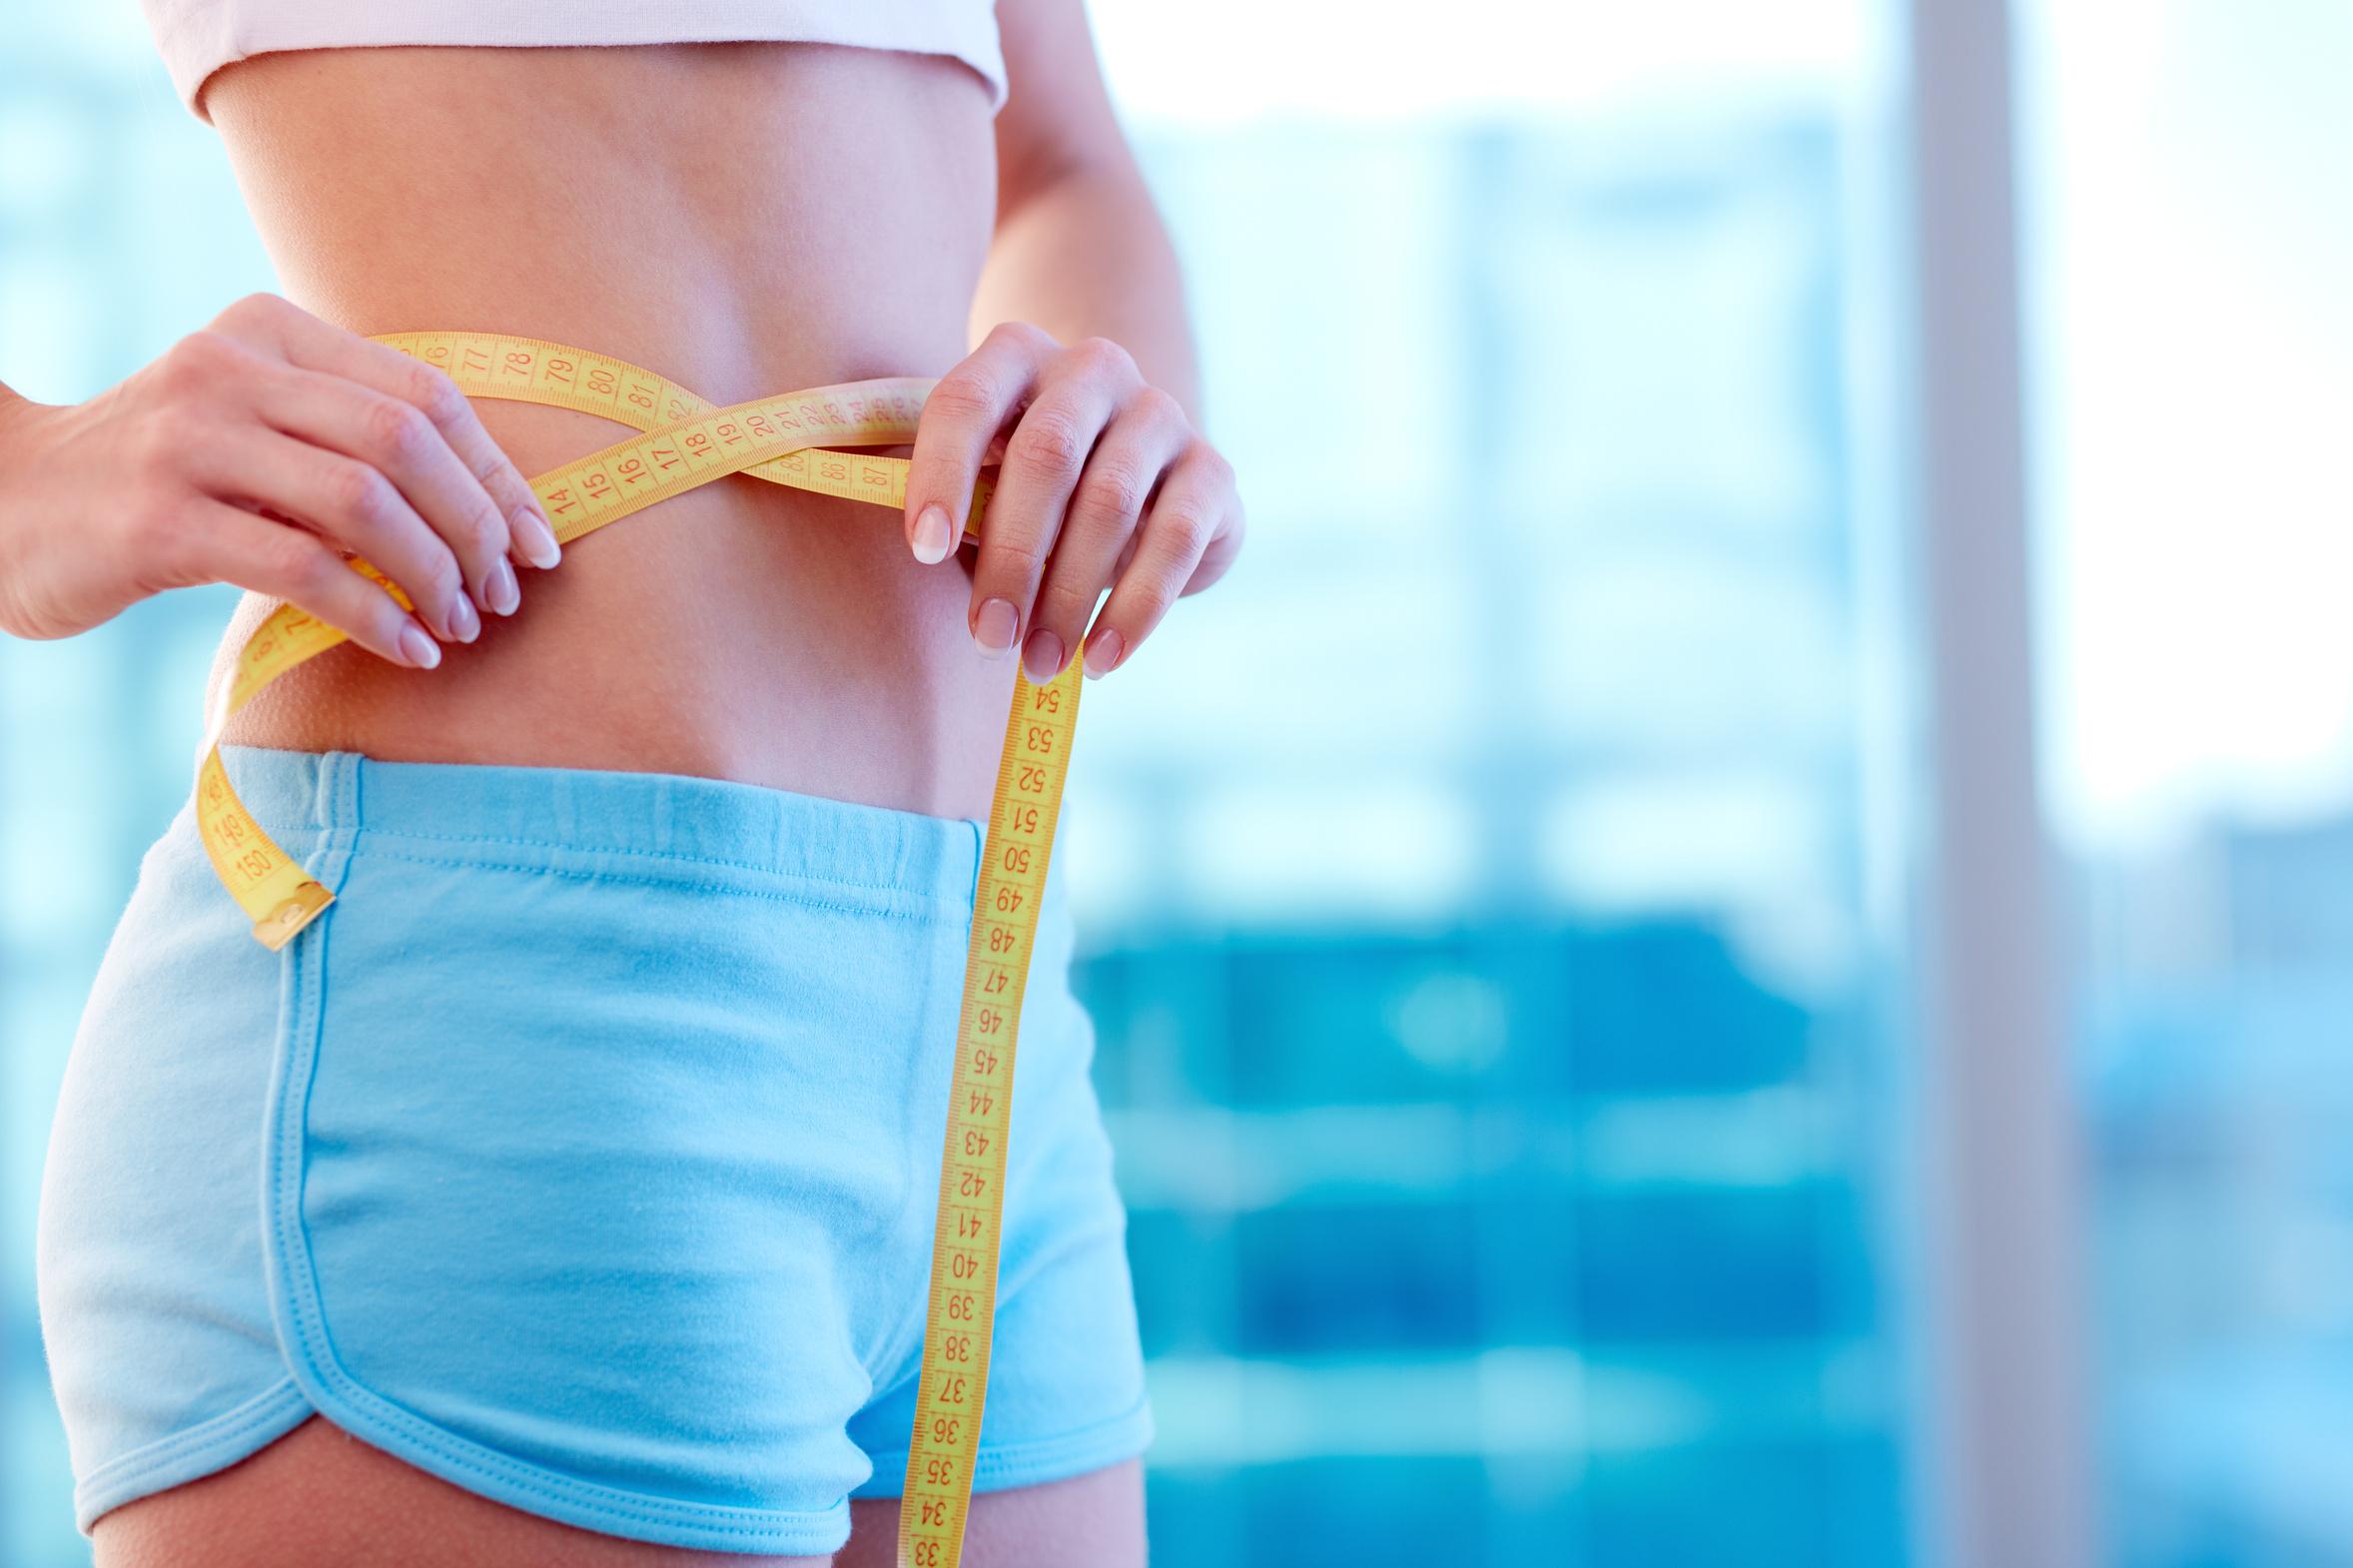 hogyan lehet fogyni 1lb hetente